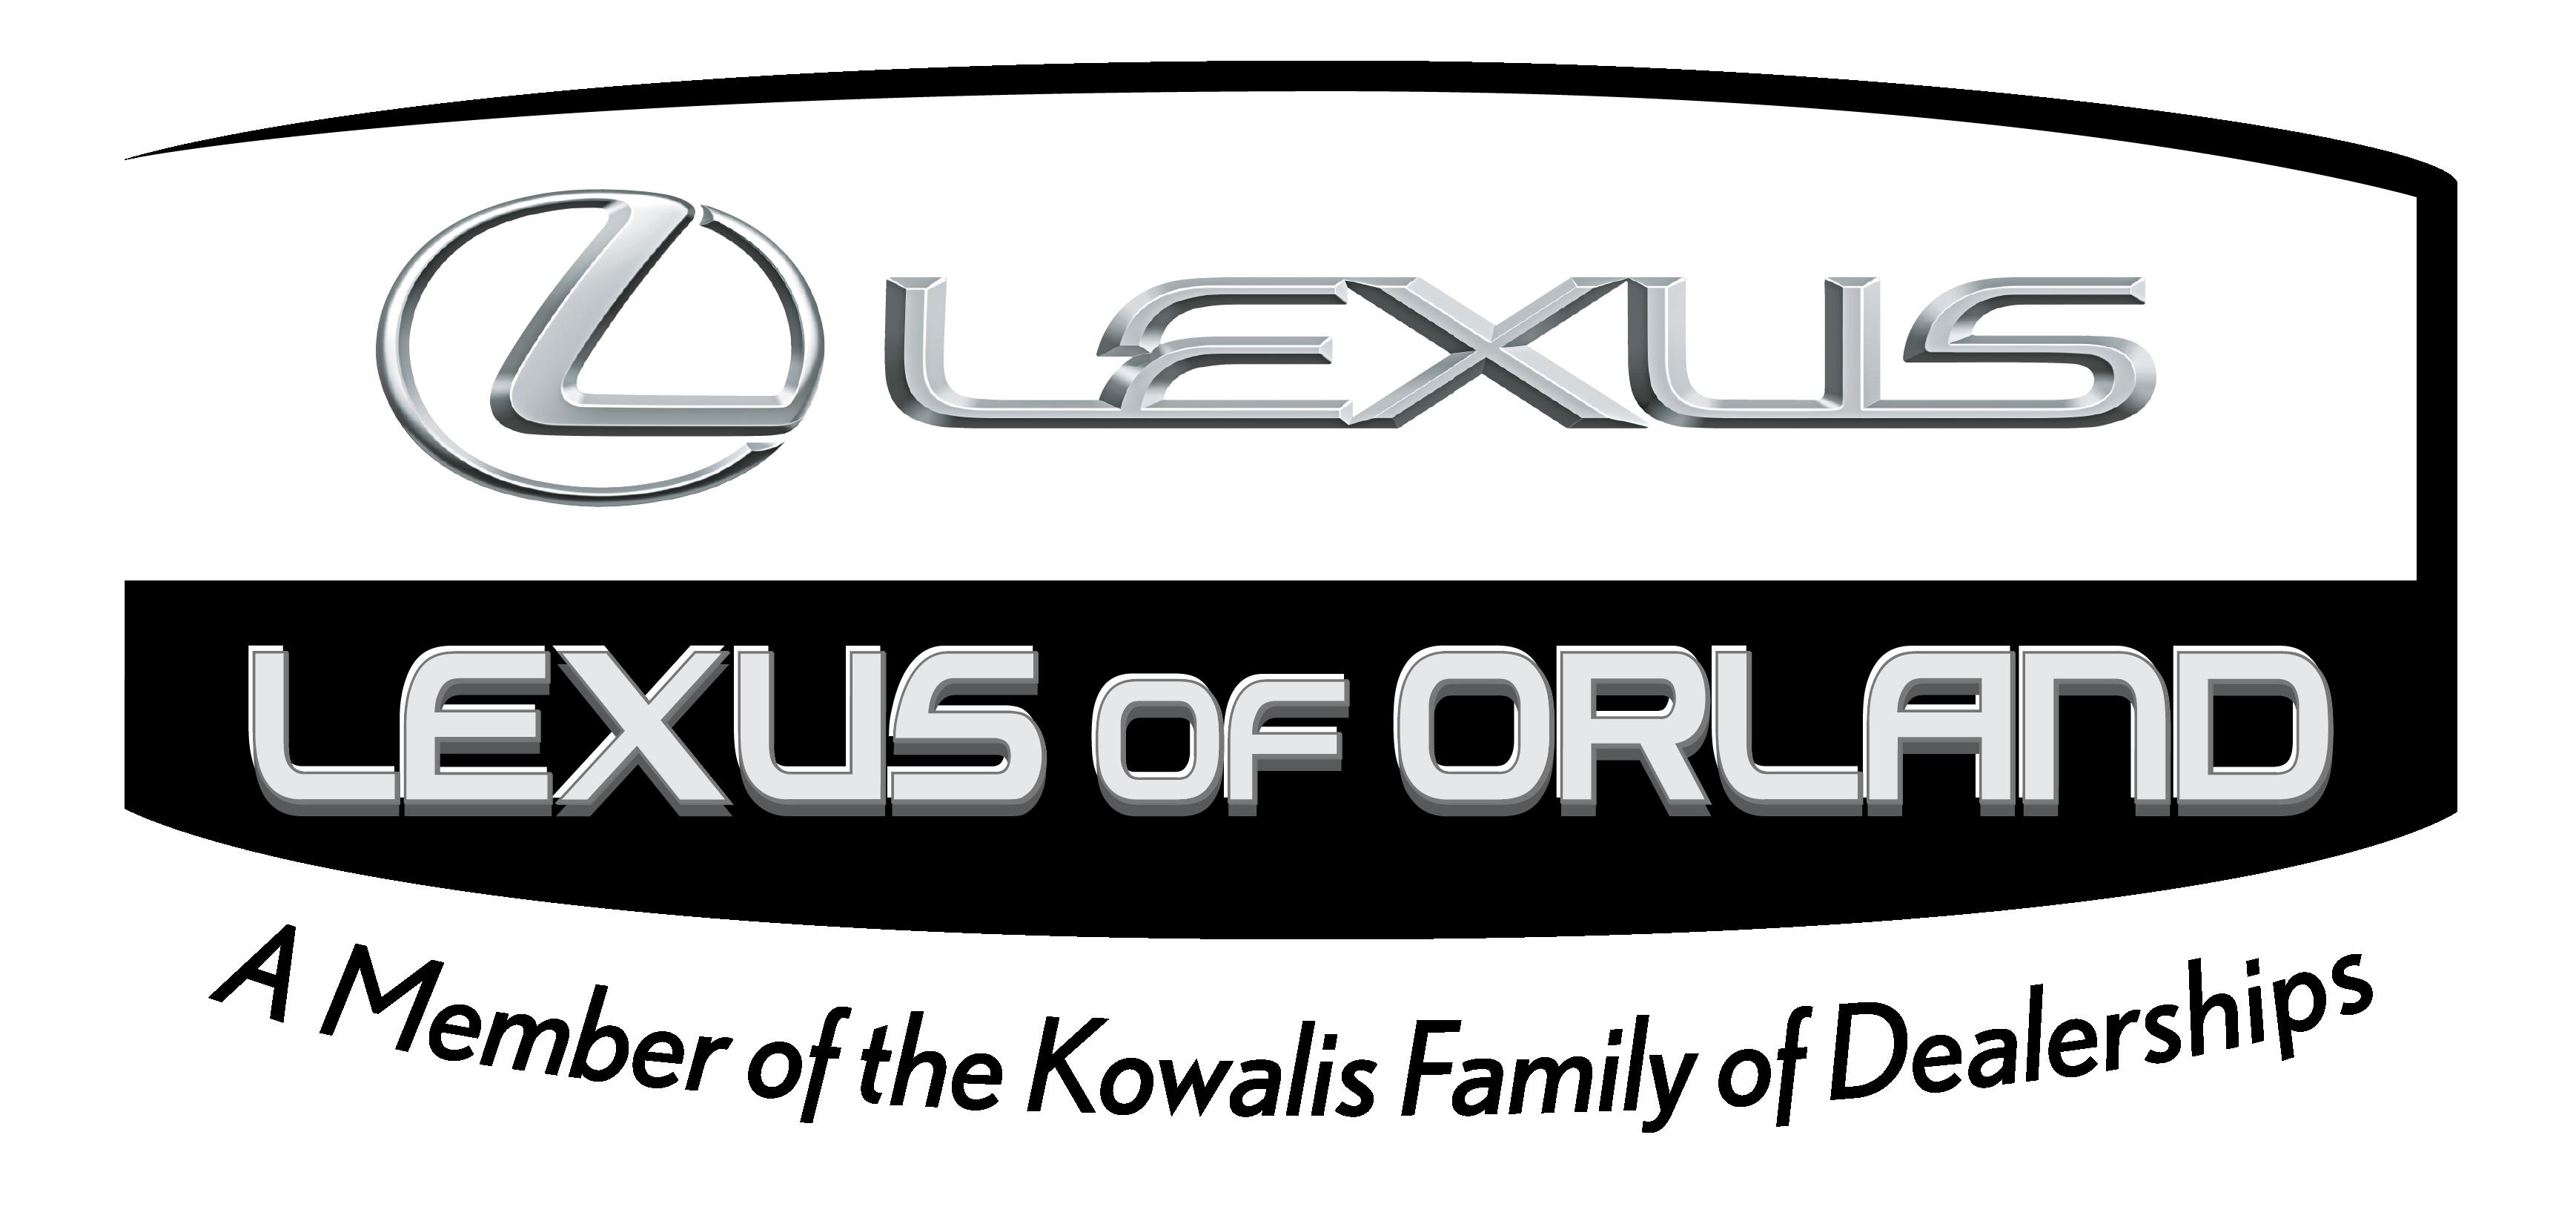 specials lincoln mkx florida dealership lease lexus orlando central